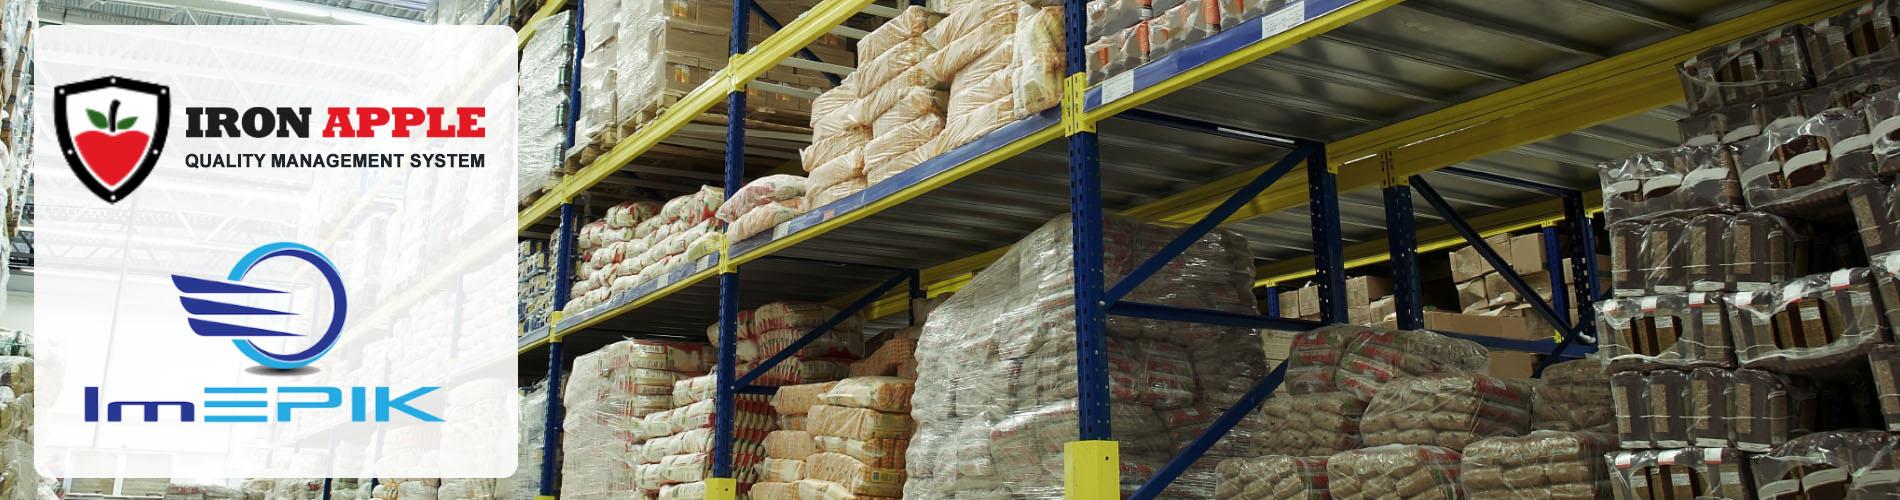 Iron Apple QMS for Food Storage & Warehouse & ImEpik Food Safety Training